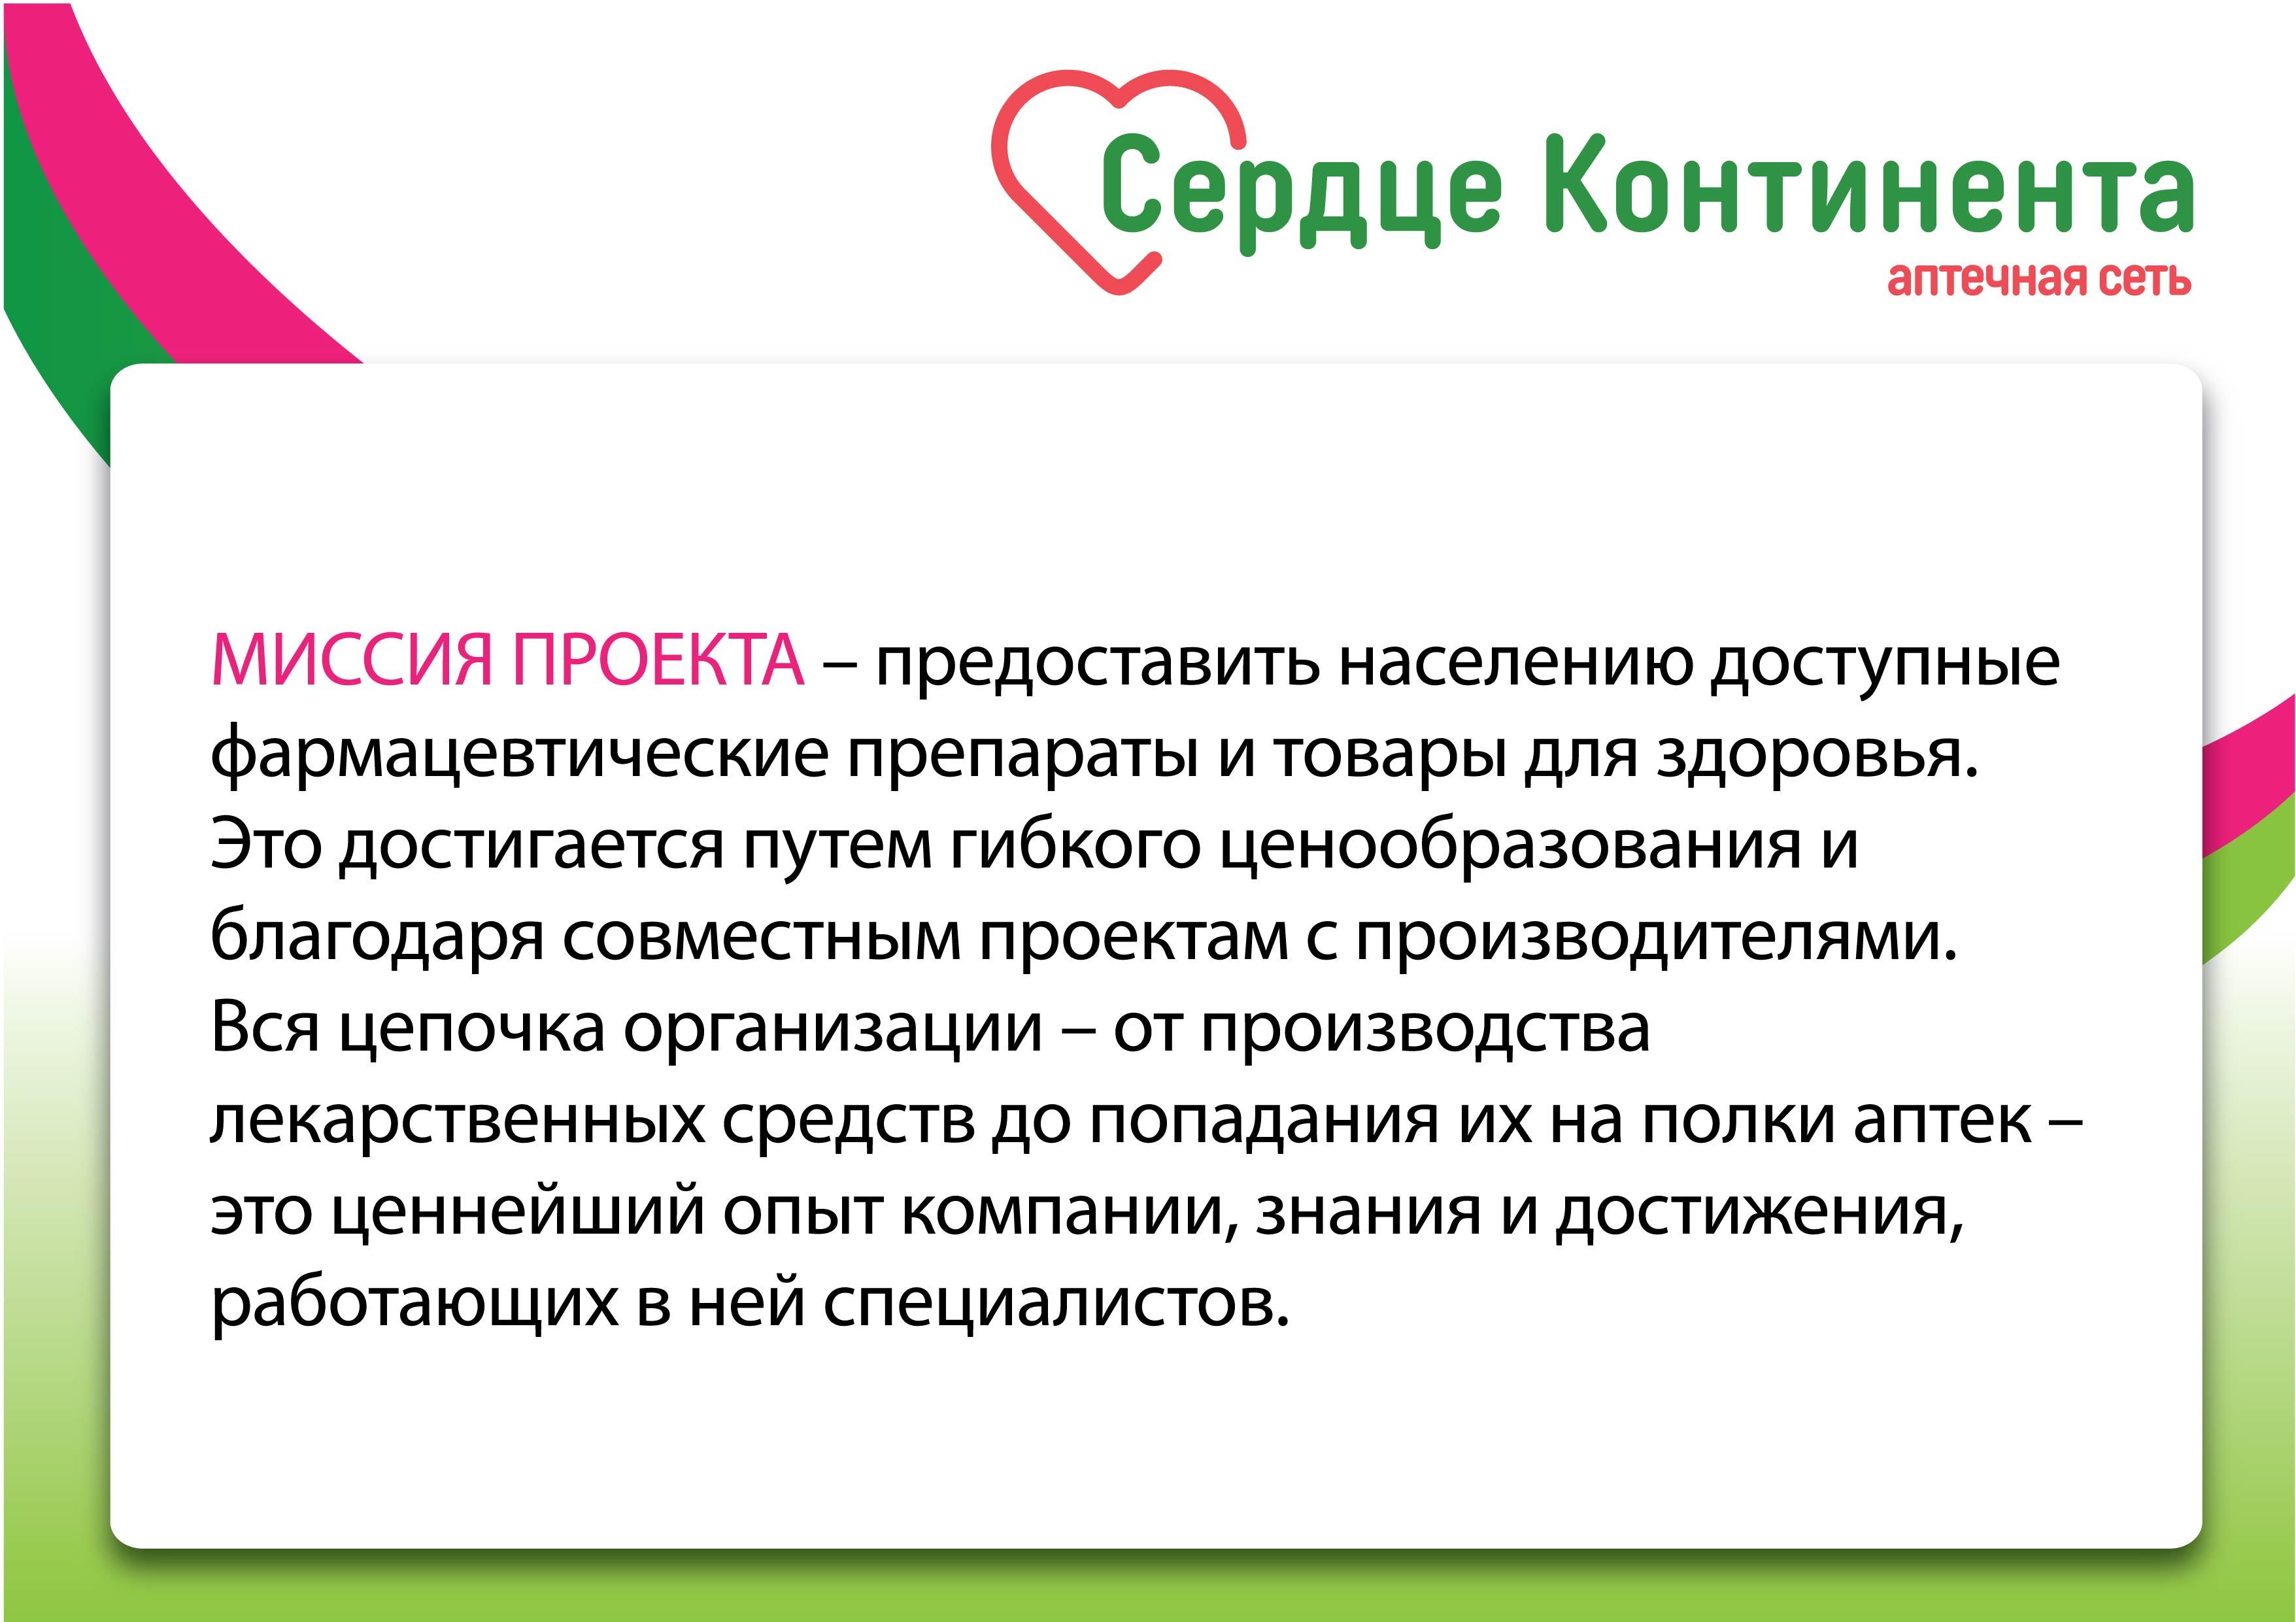 Сердце Вятки презентация_Page_02